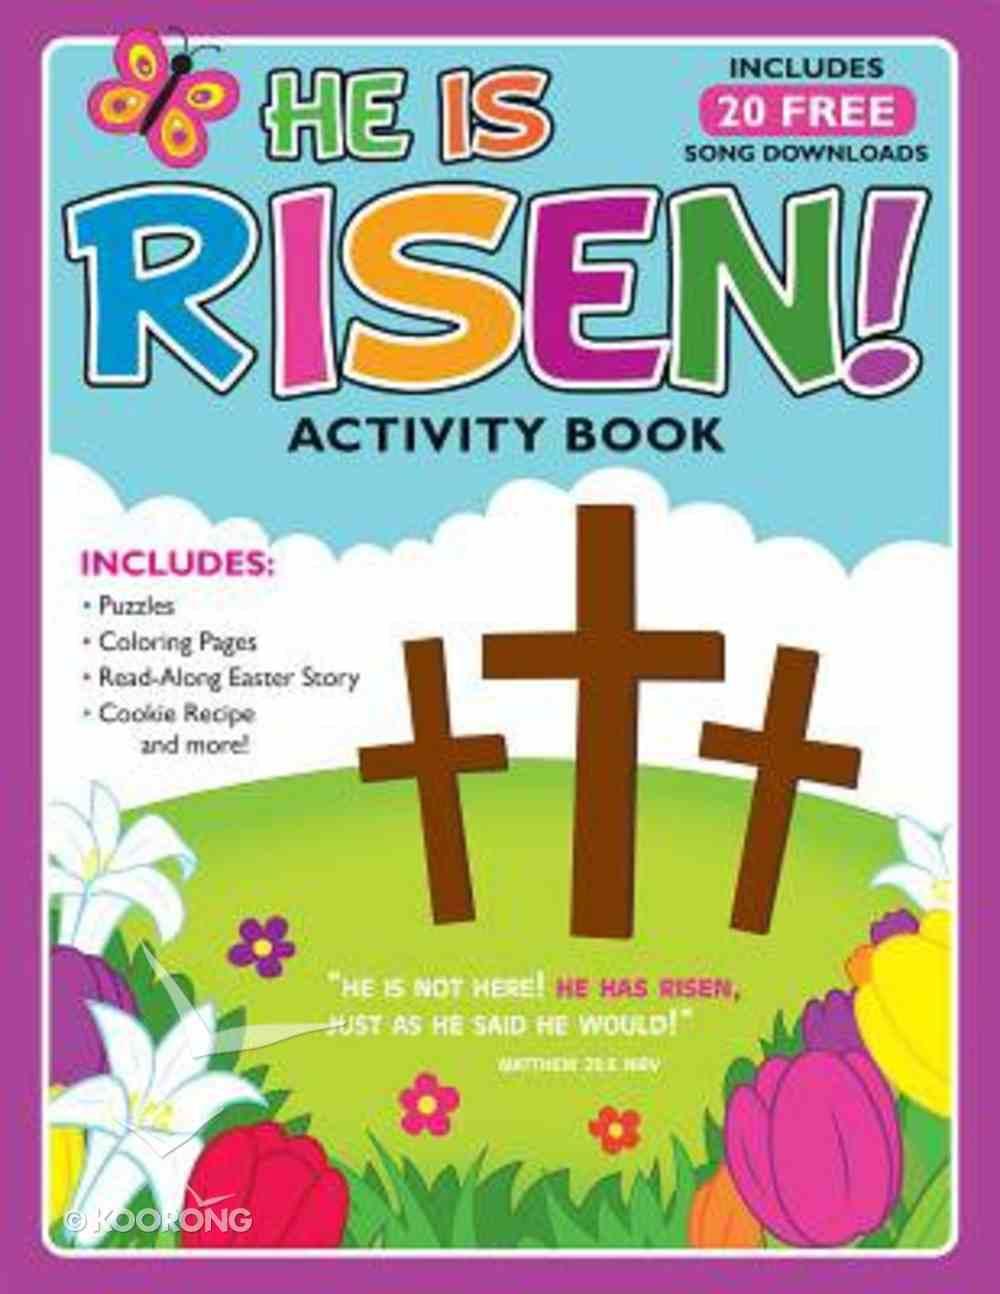 Activity Book: He is Risen! (Free Album Download) Paperback